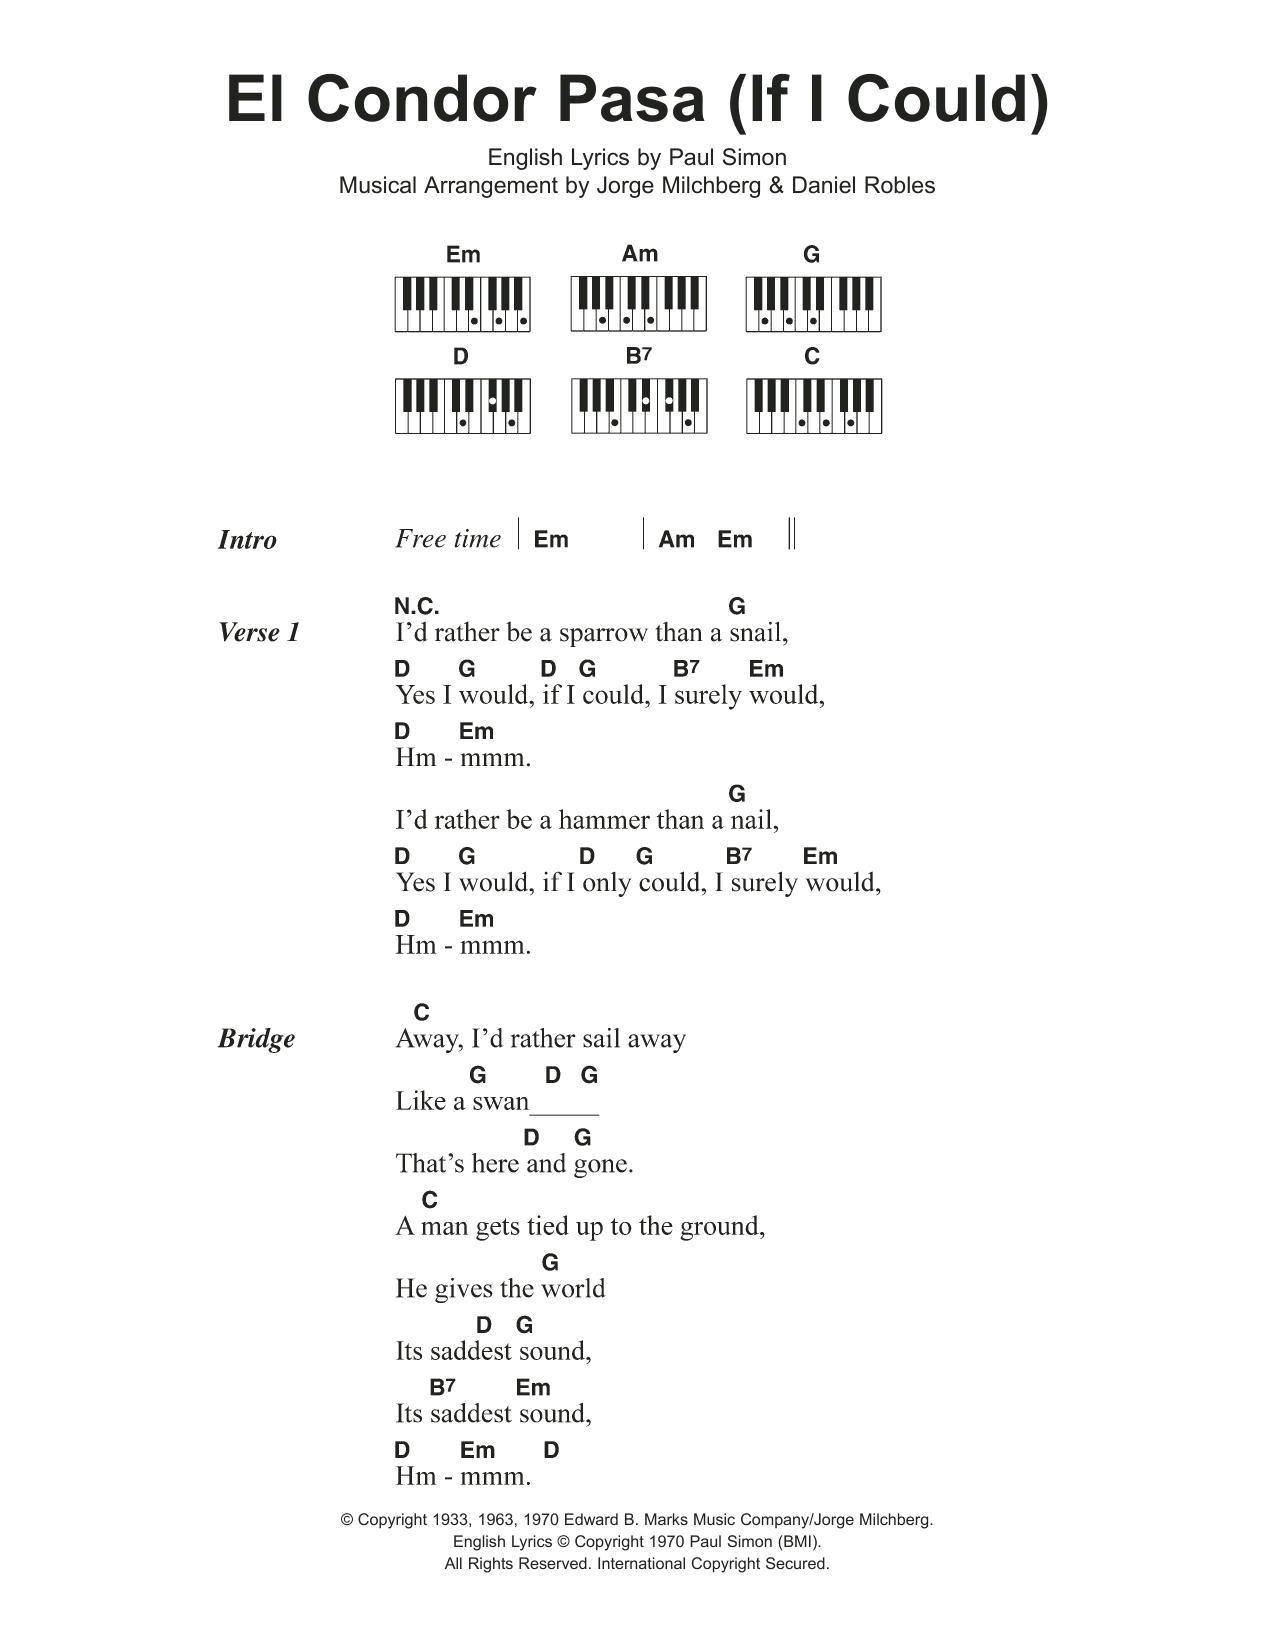 El Condor Pasa If I Could Sheet Music Simon Garfunkel Lyrics